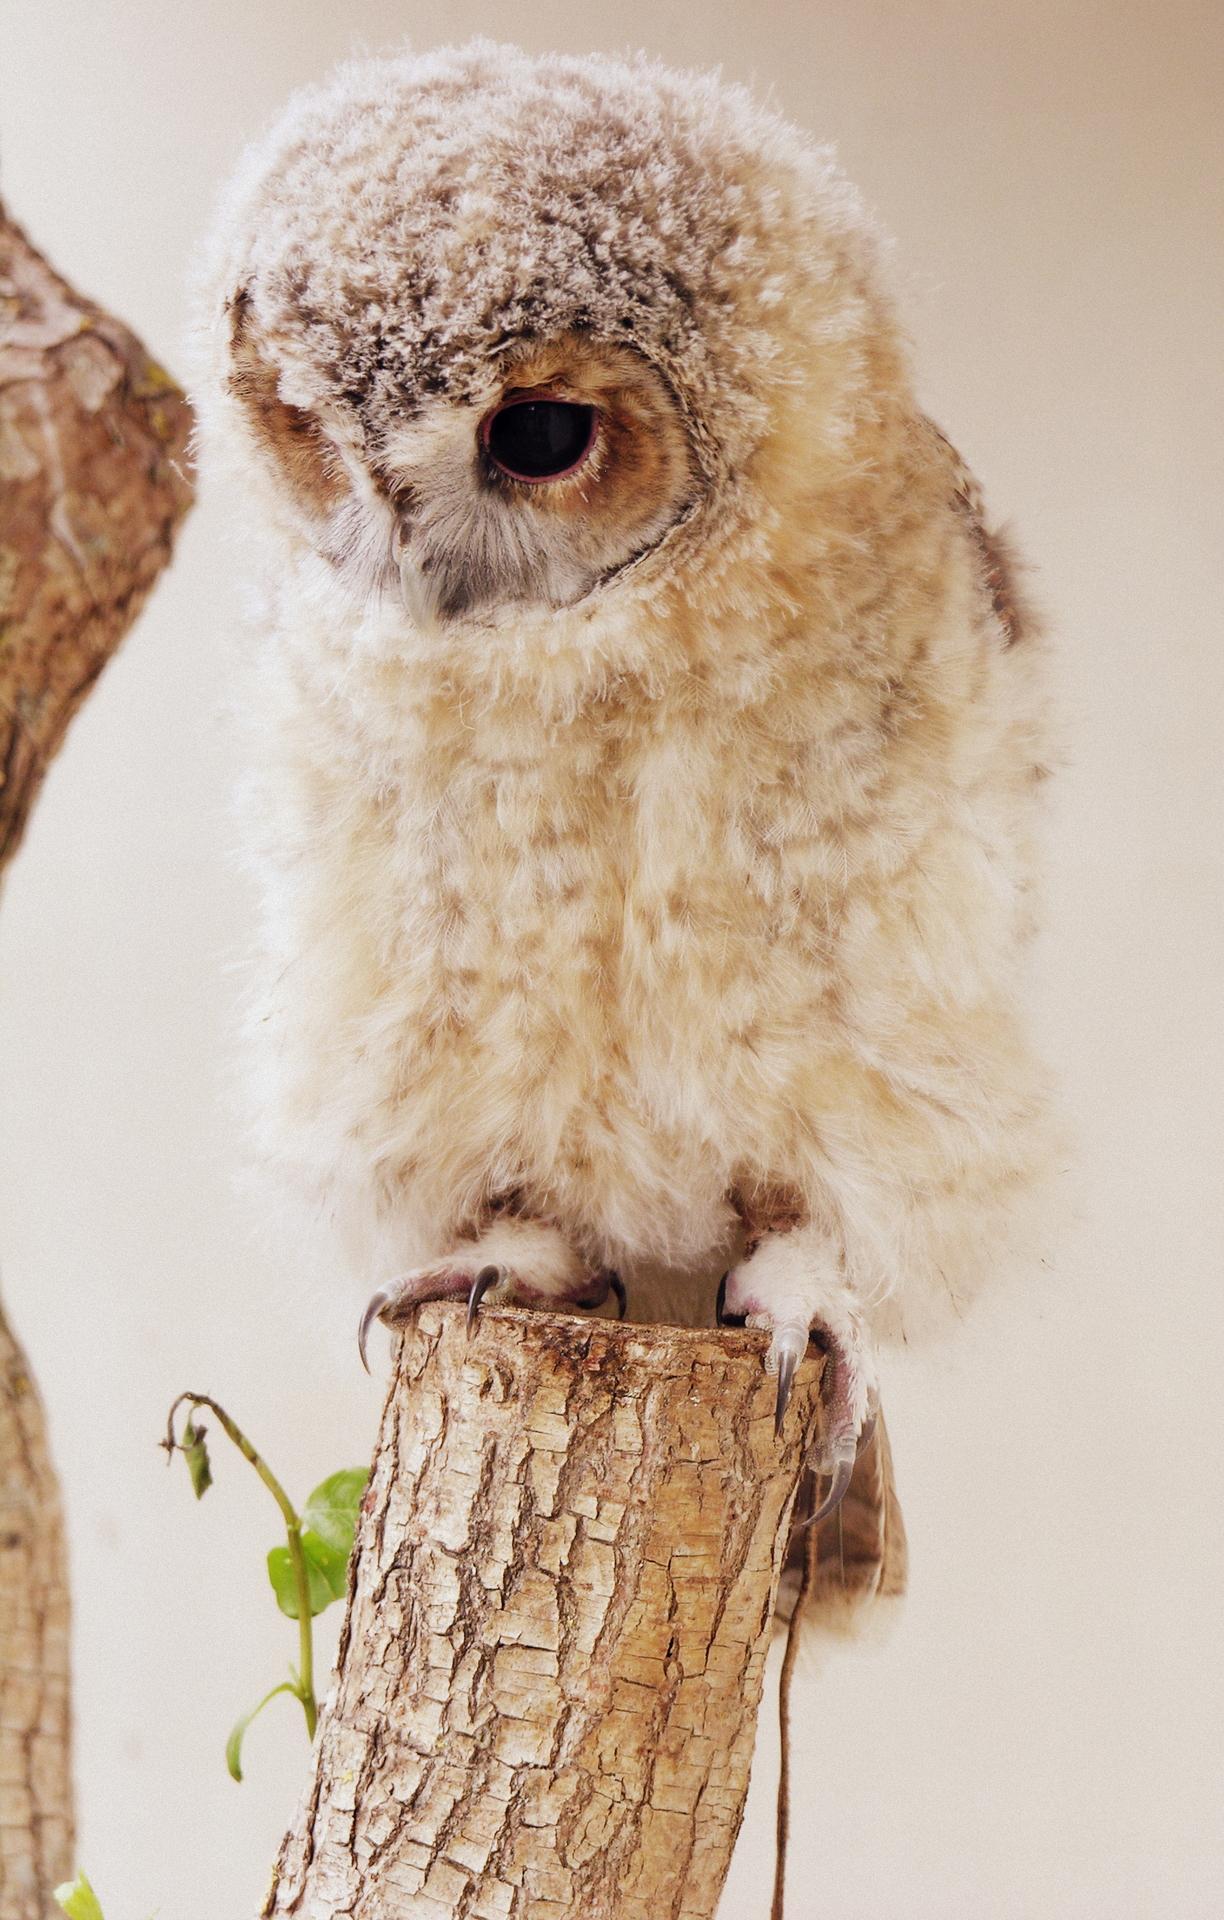 owl bird cute wildlife animal nature wood one little portrait eye